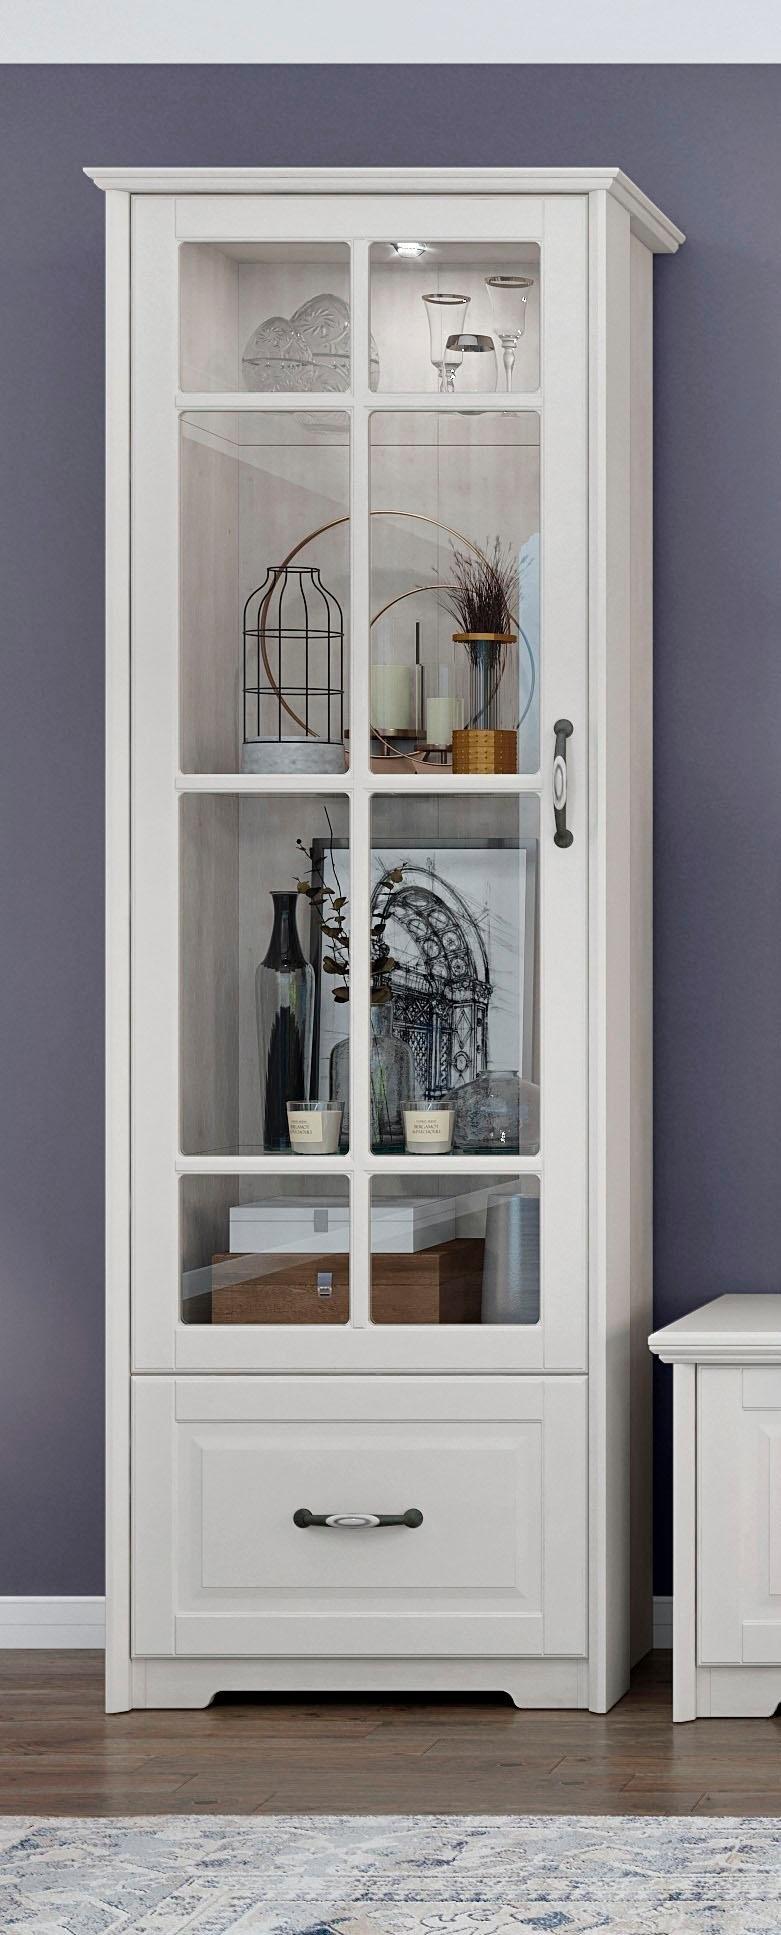 Home affaire vitrinekast »Evergreen« bij OTTO online kopen